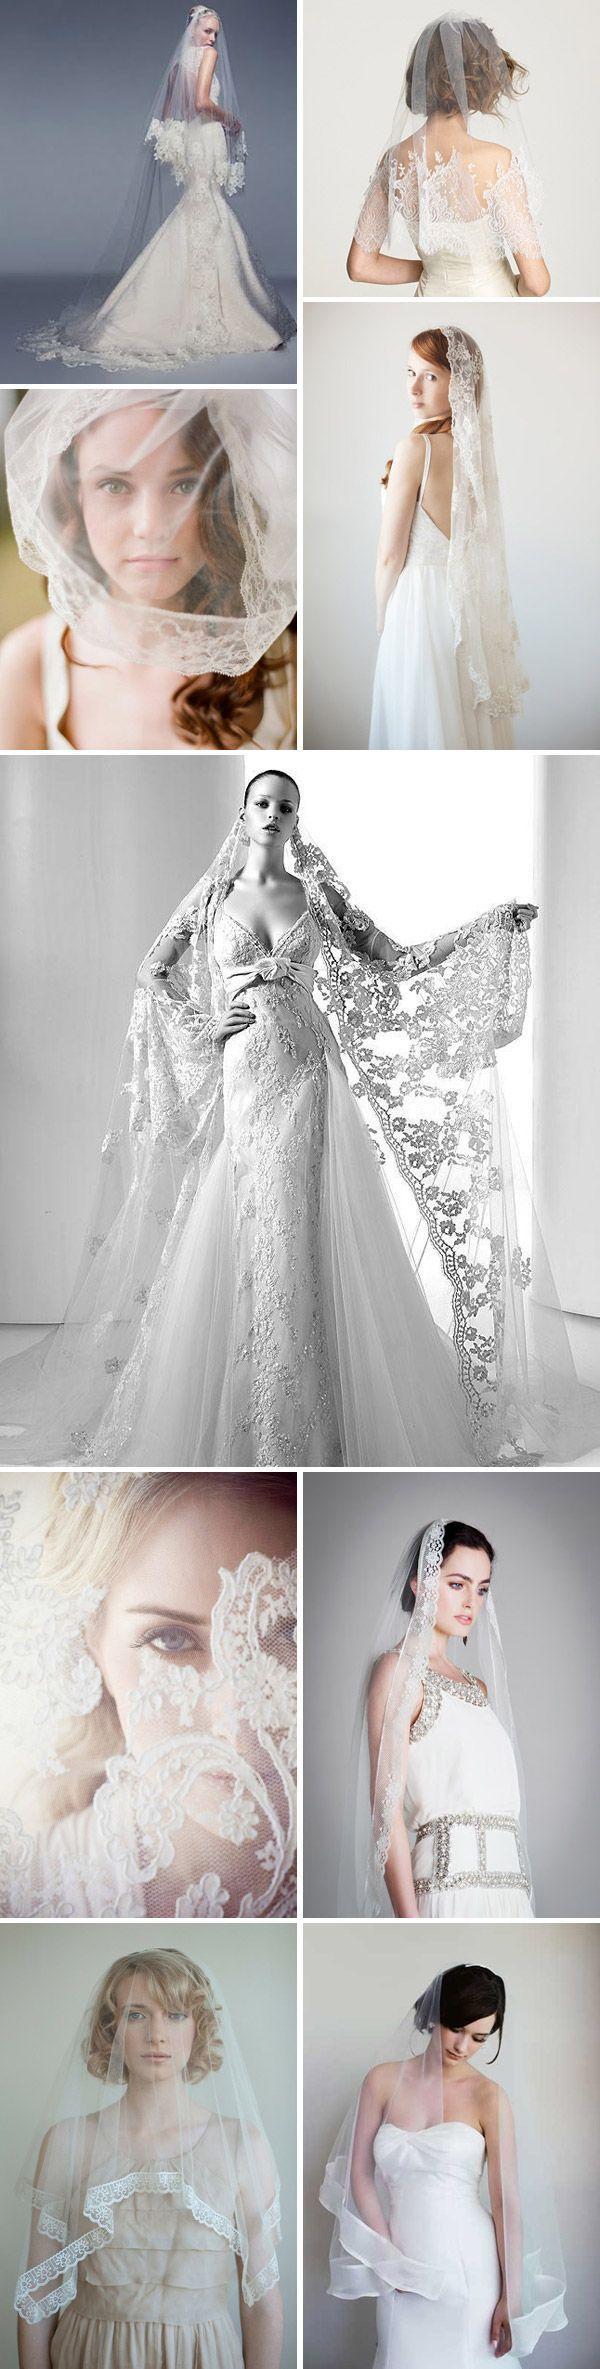 Mariage - Veiled.